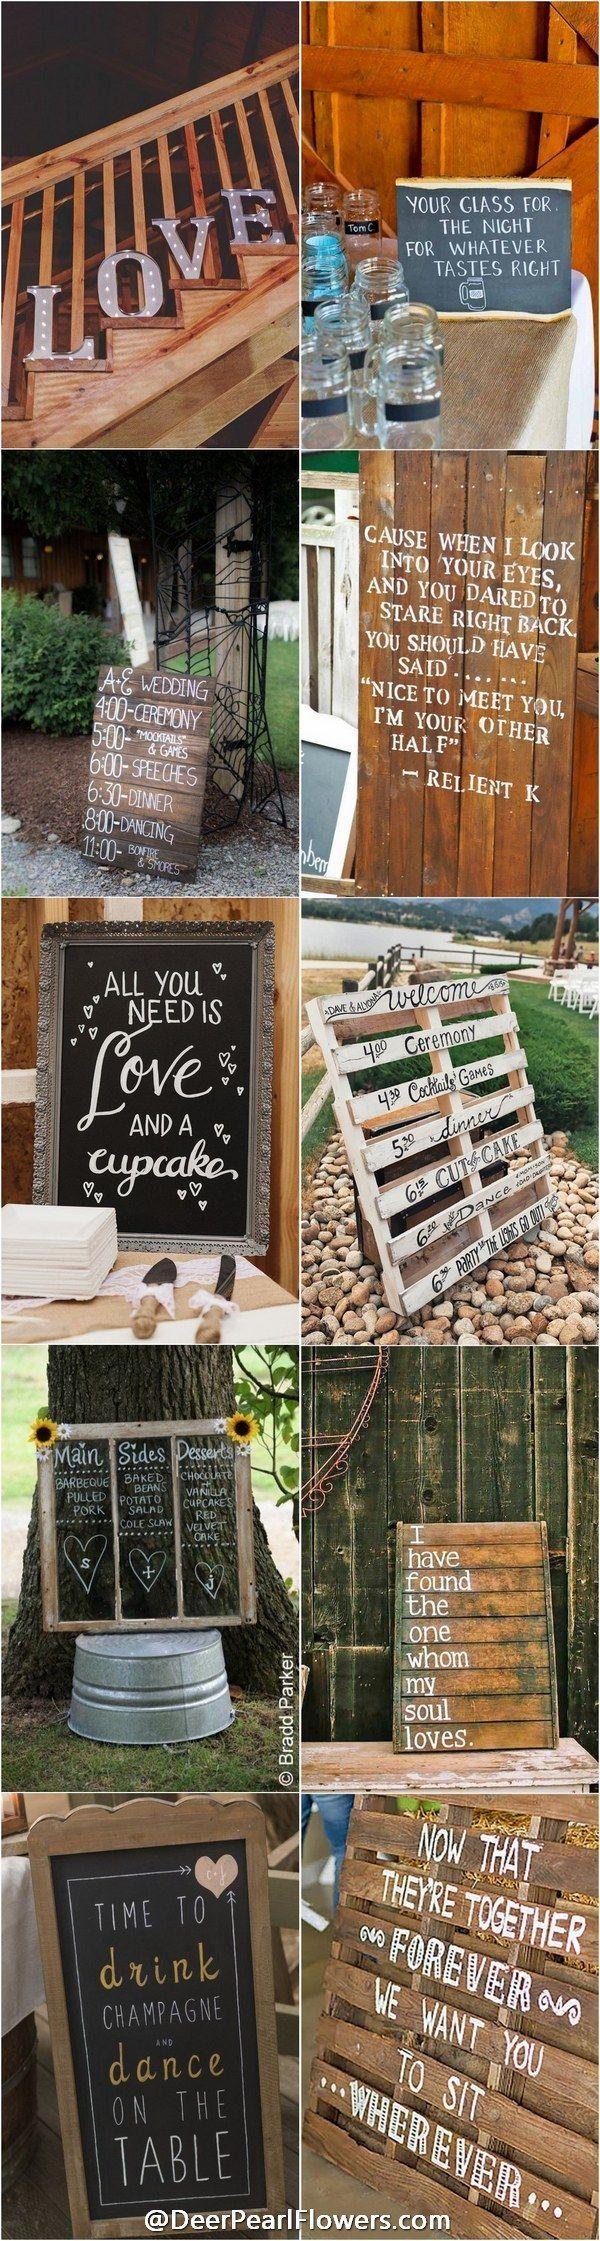 30 rustic wedding signs u0026 ideas for weddings rustic country